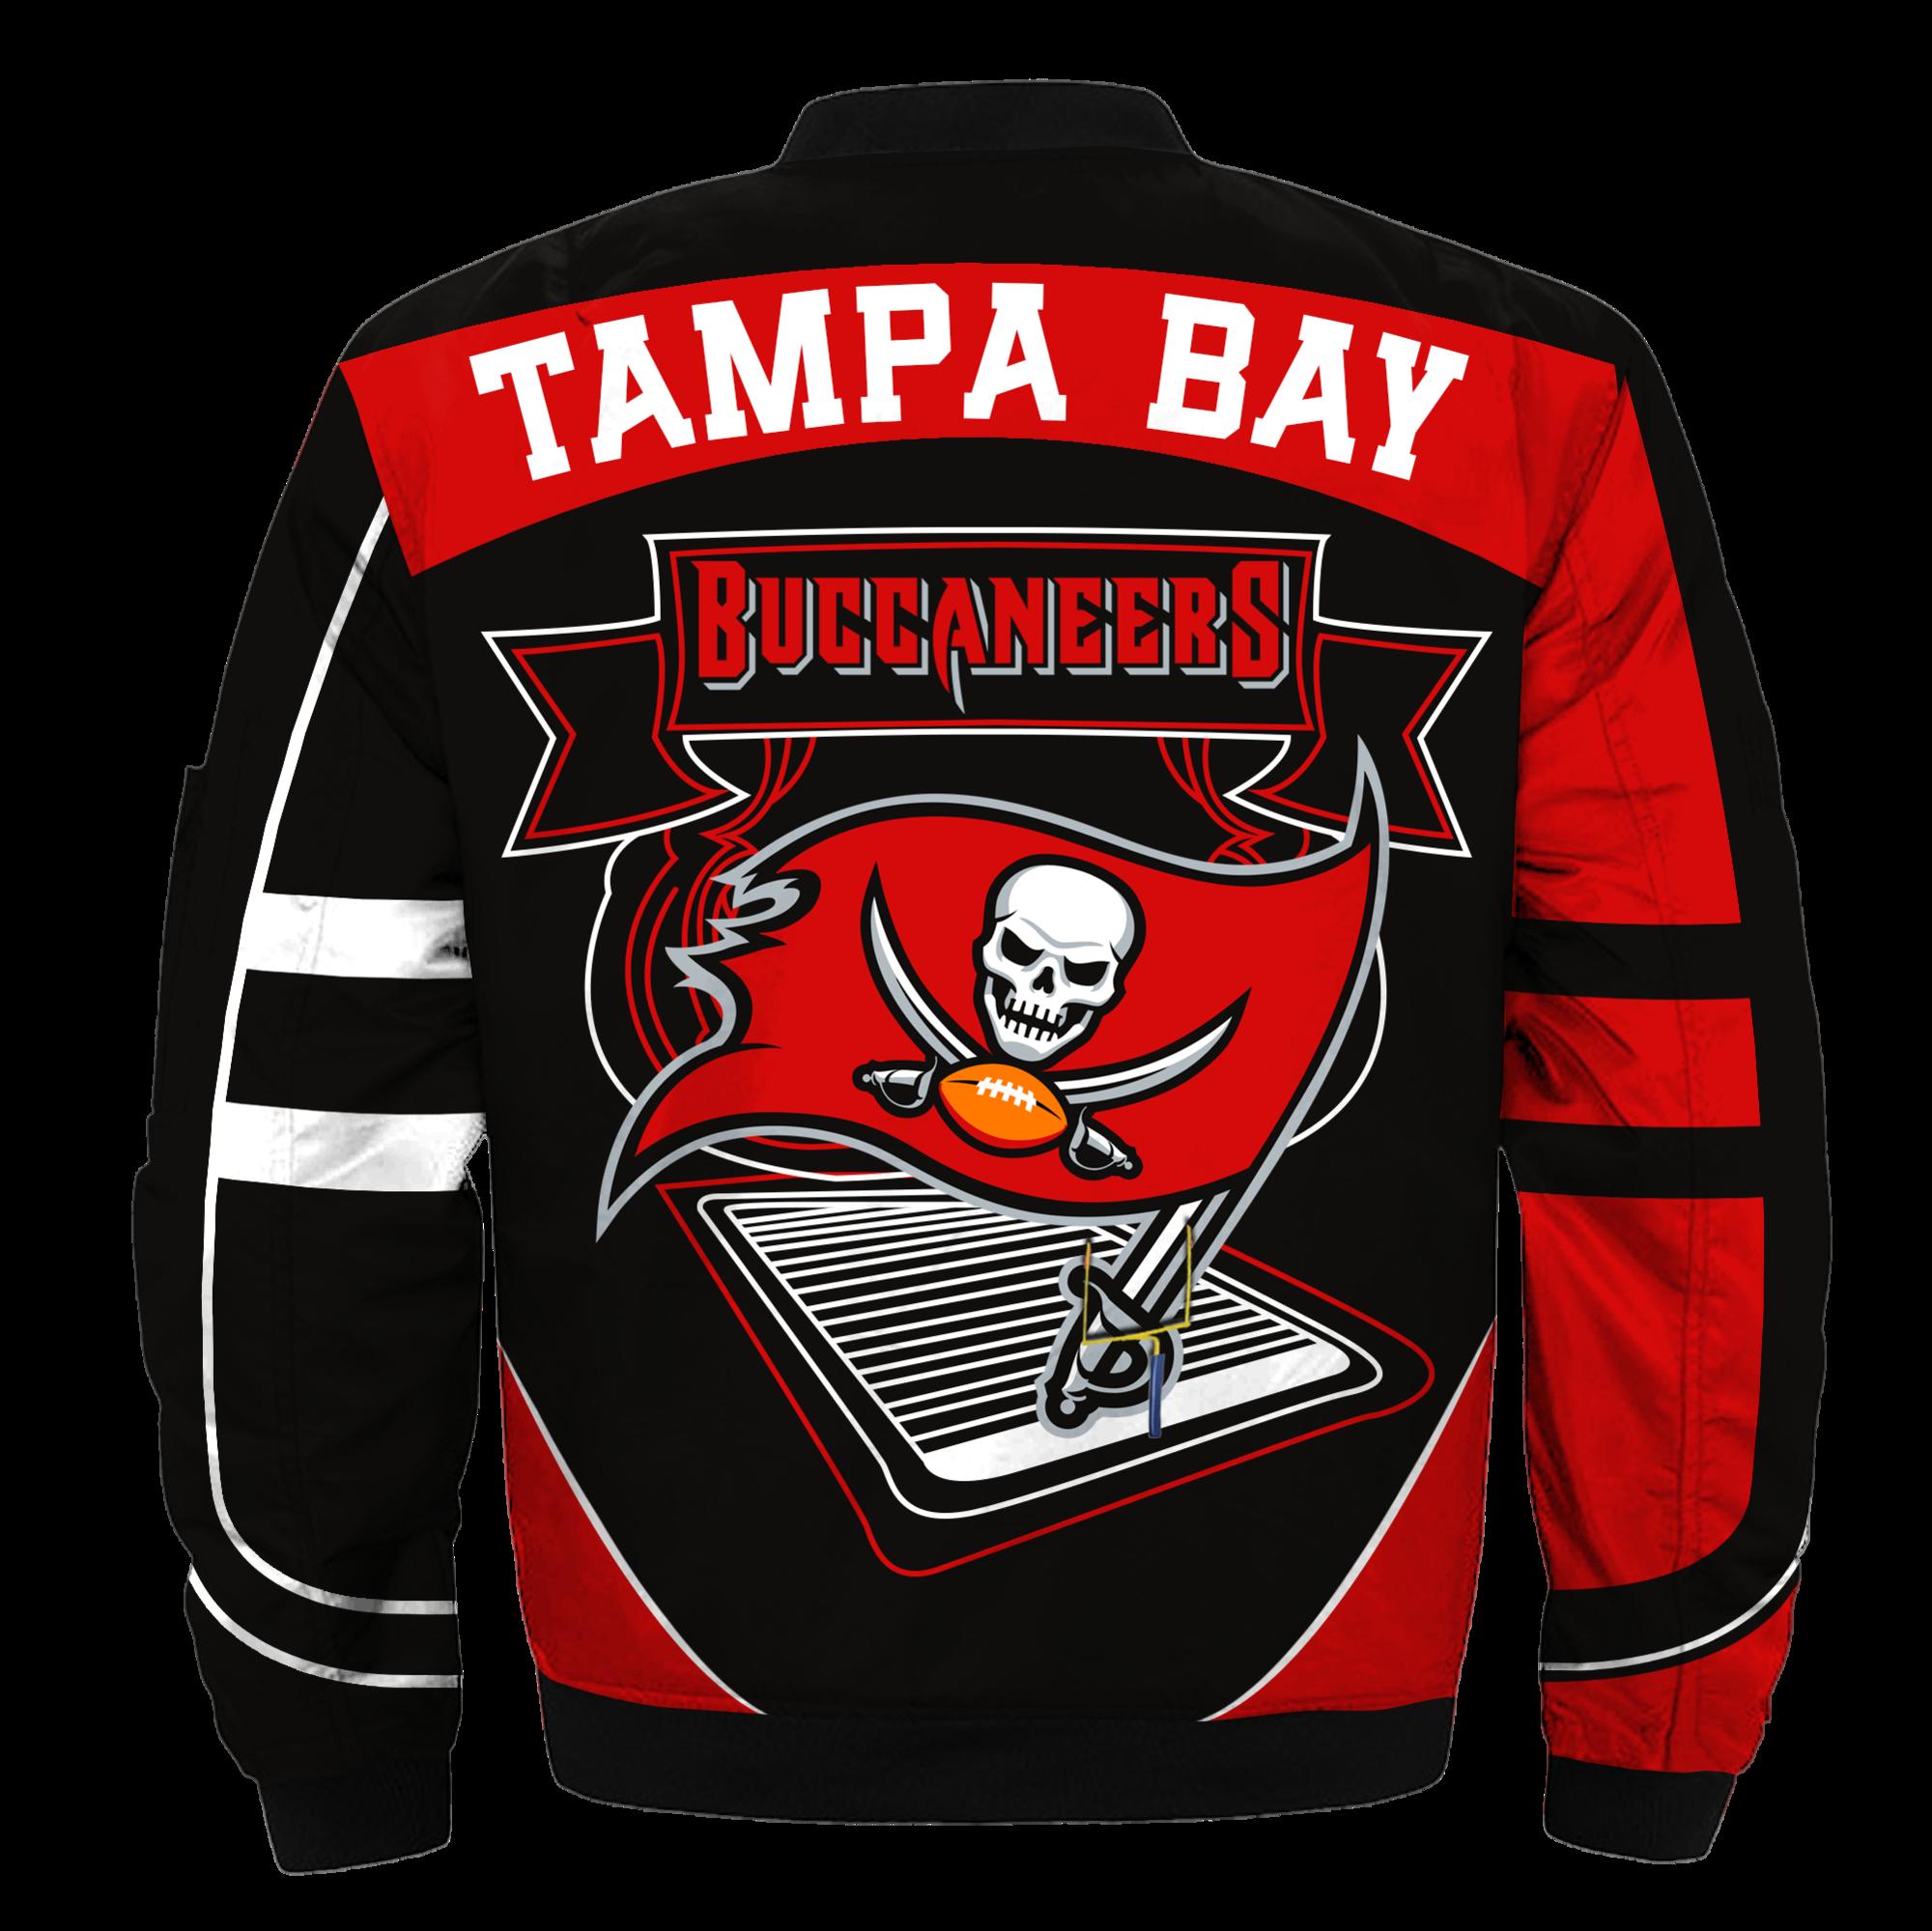 Tampa Bay Buccaneers Bomber Jacket Nfl Tampa Bay Buccaneers Apparel En 2020 Nfl